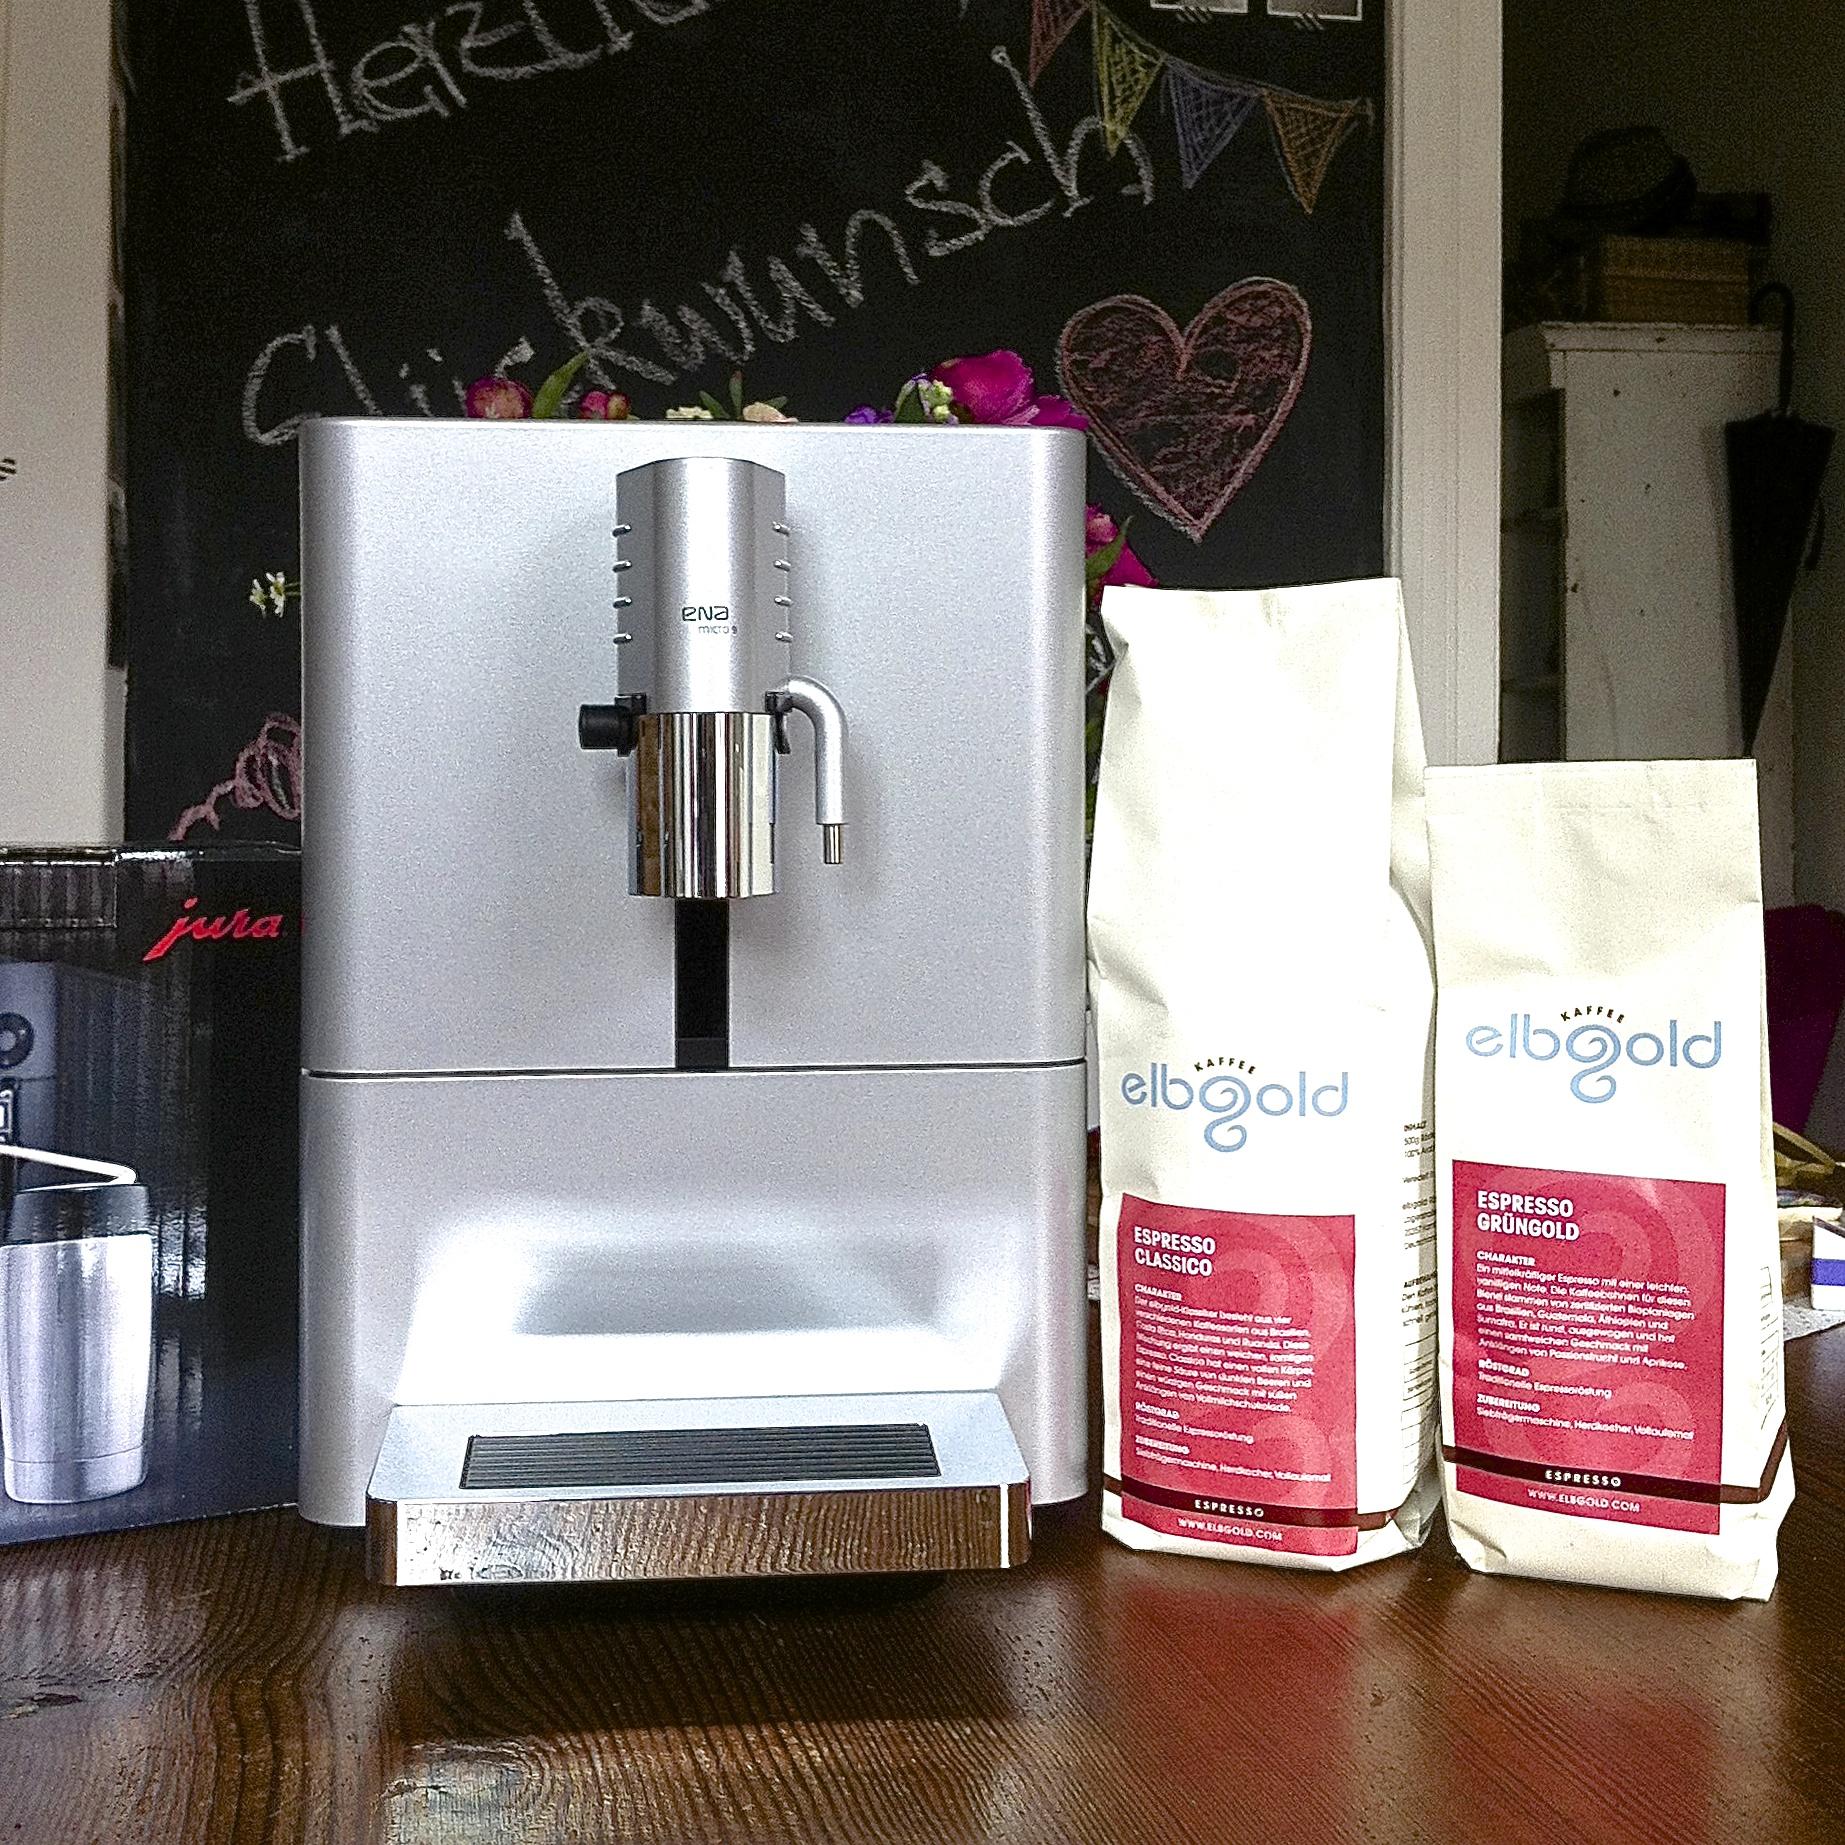 Jura Kaffeevollautomat, Elbgold Kaffee